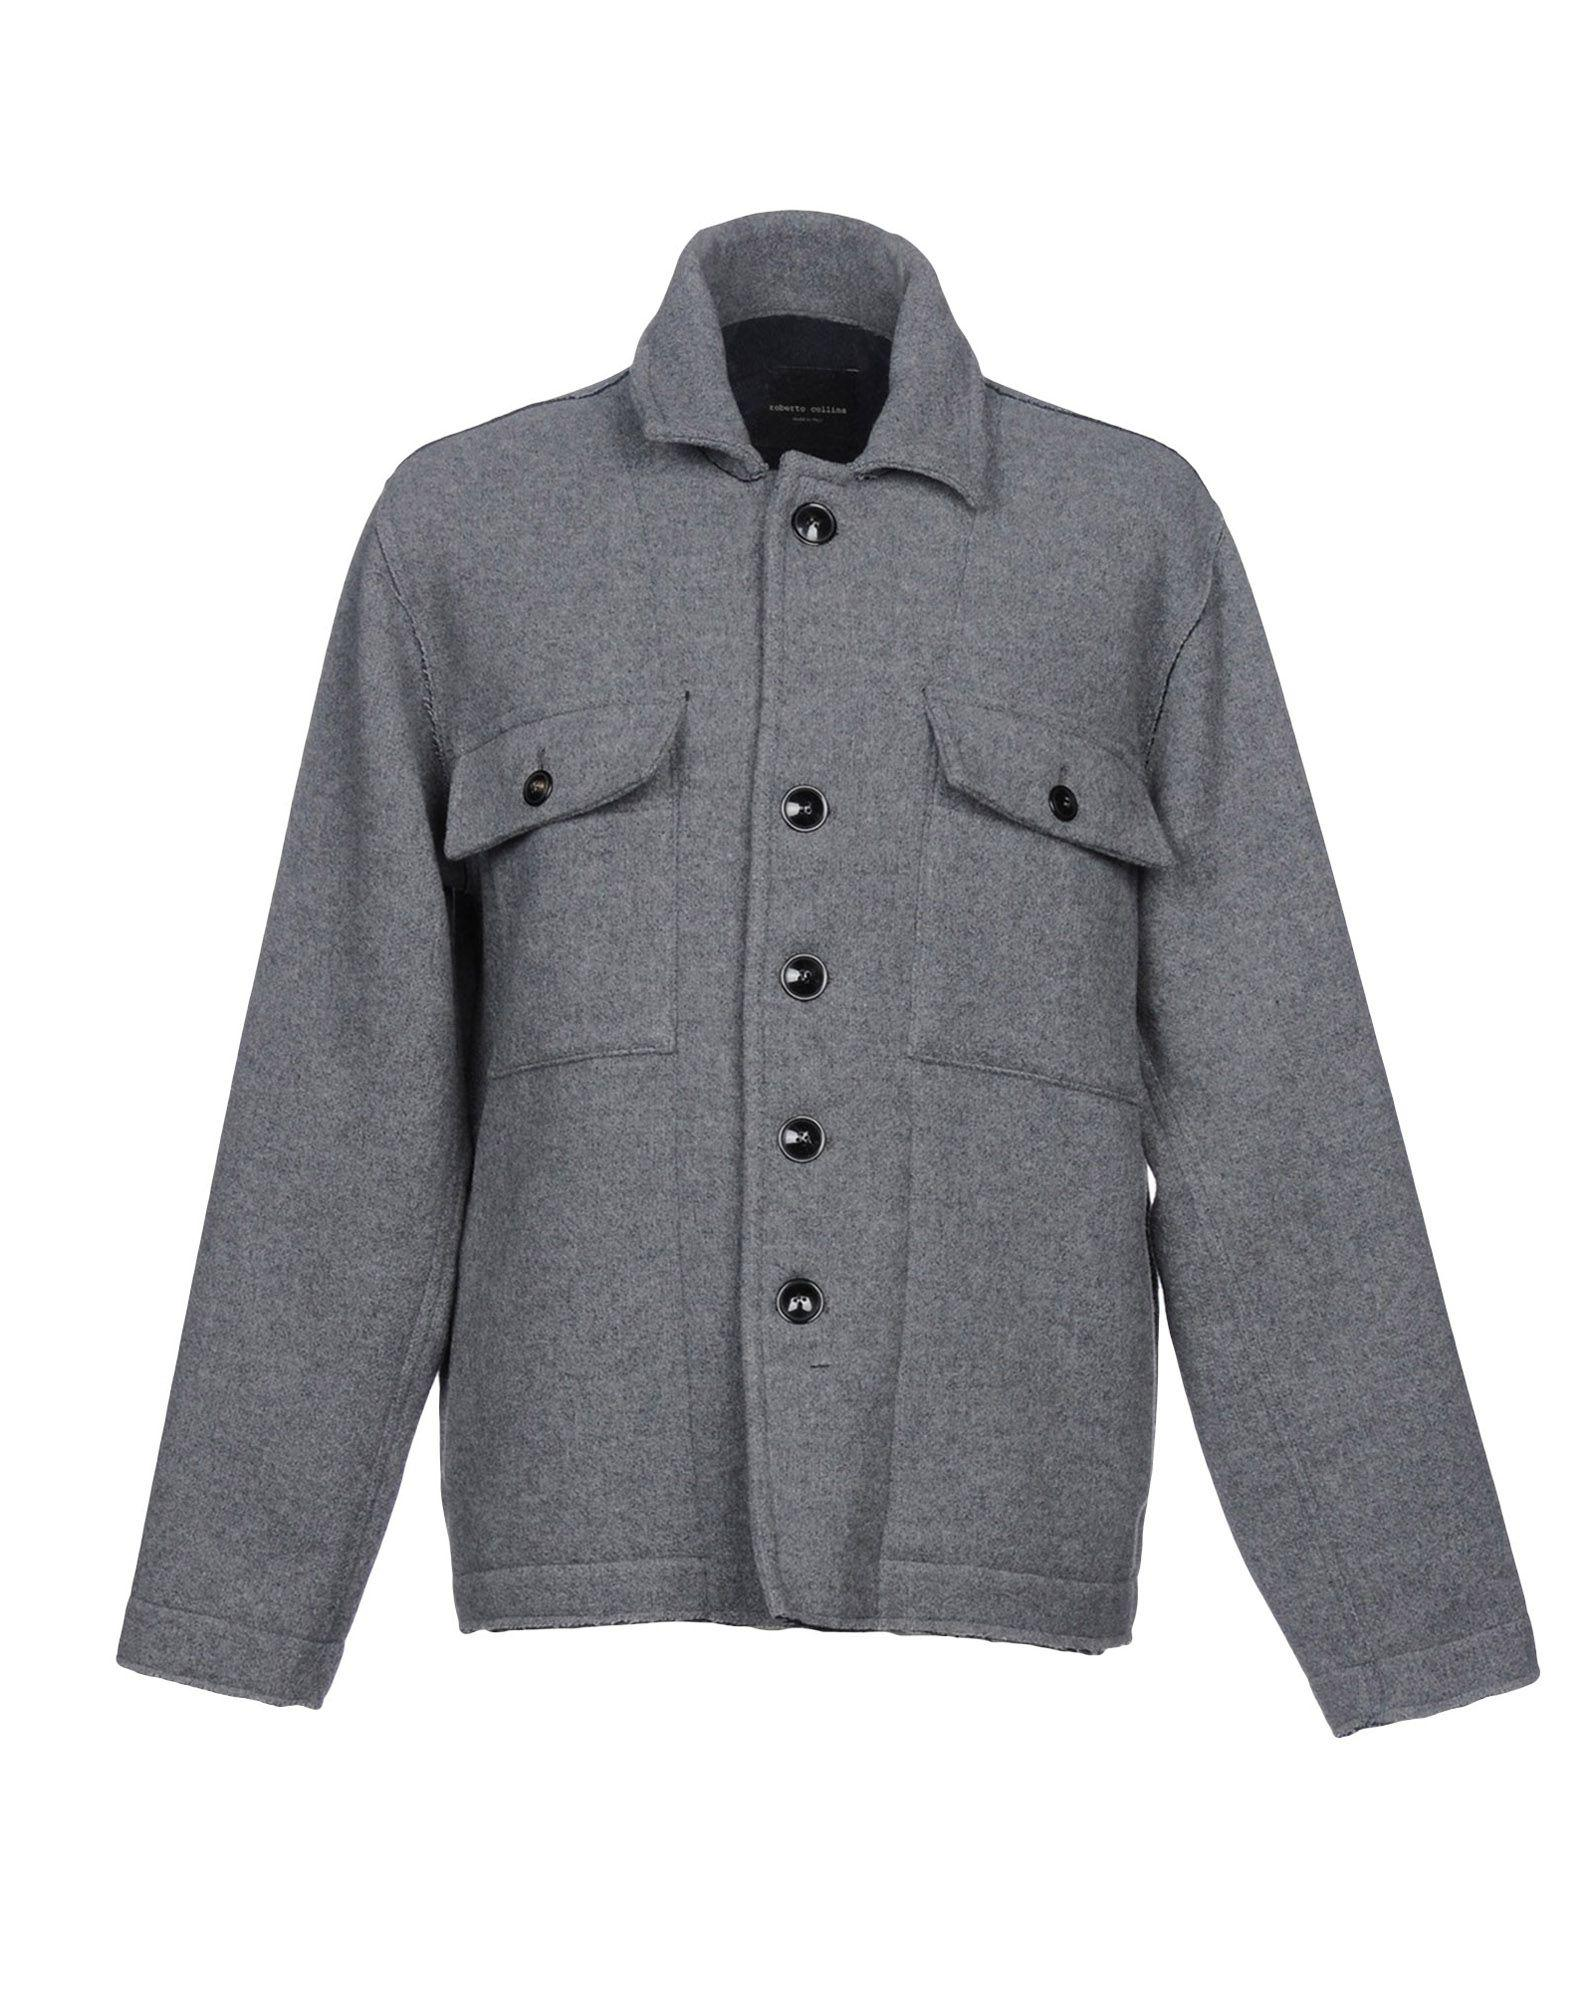 Roberto Collina Jacket In Grey